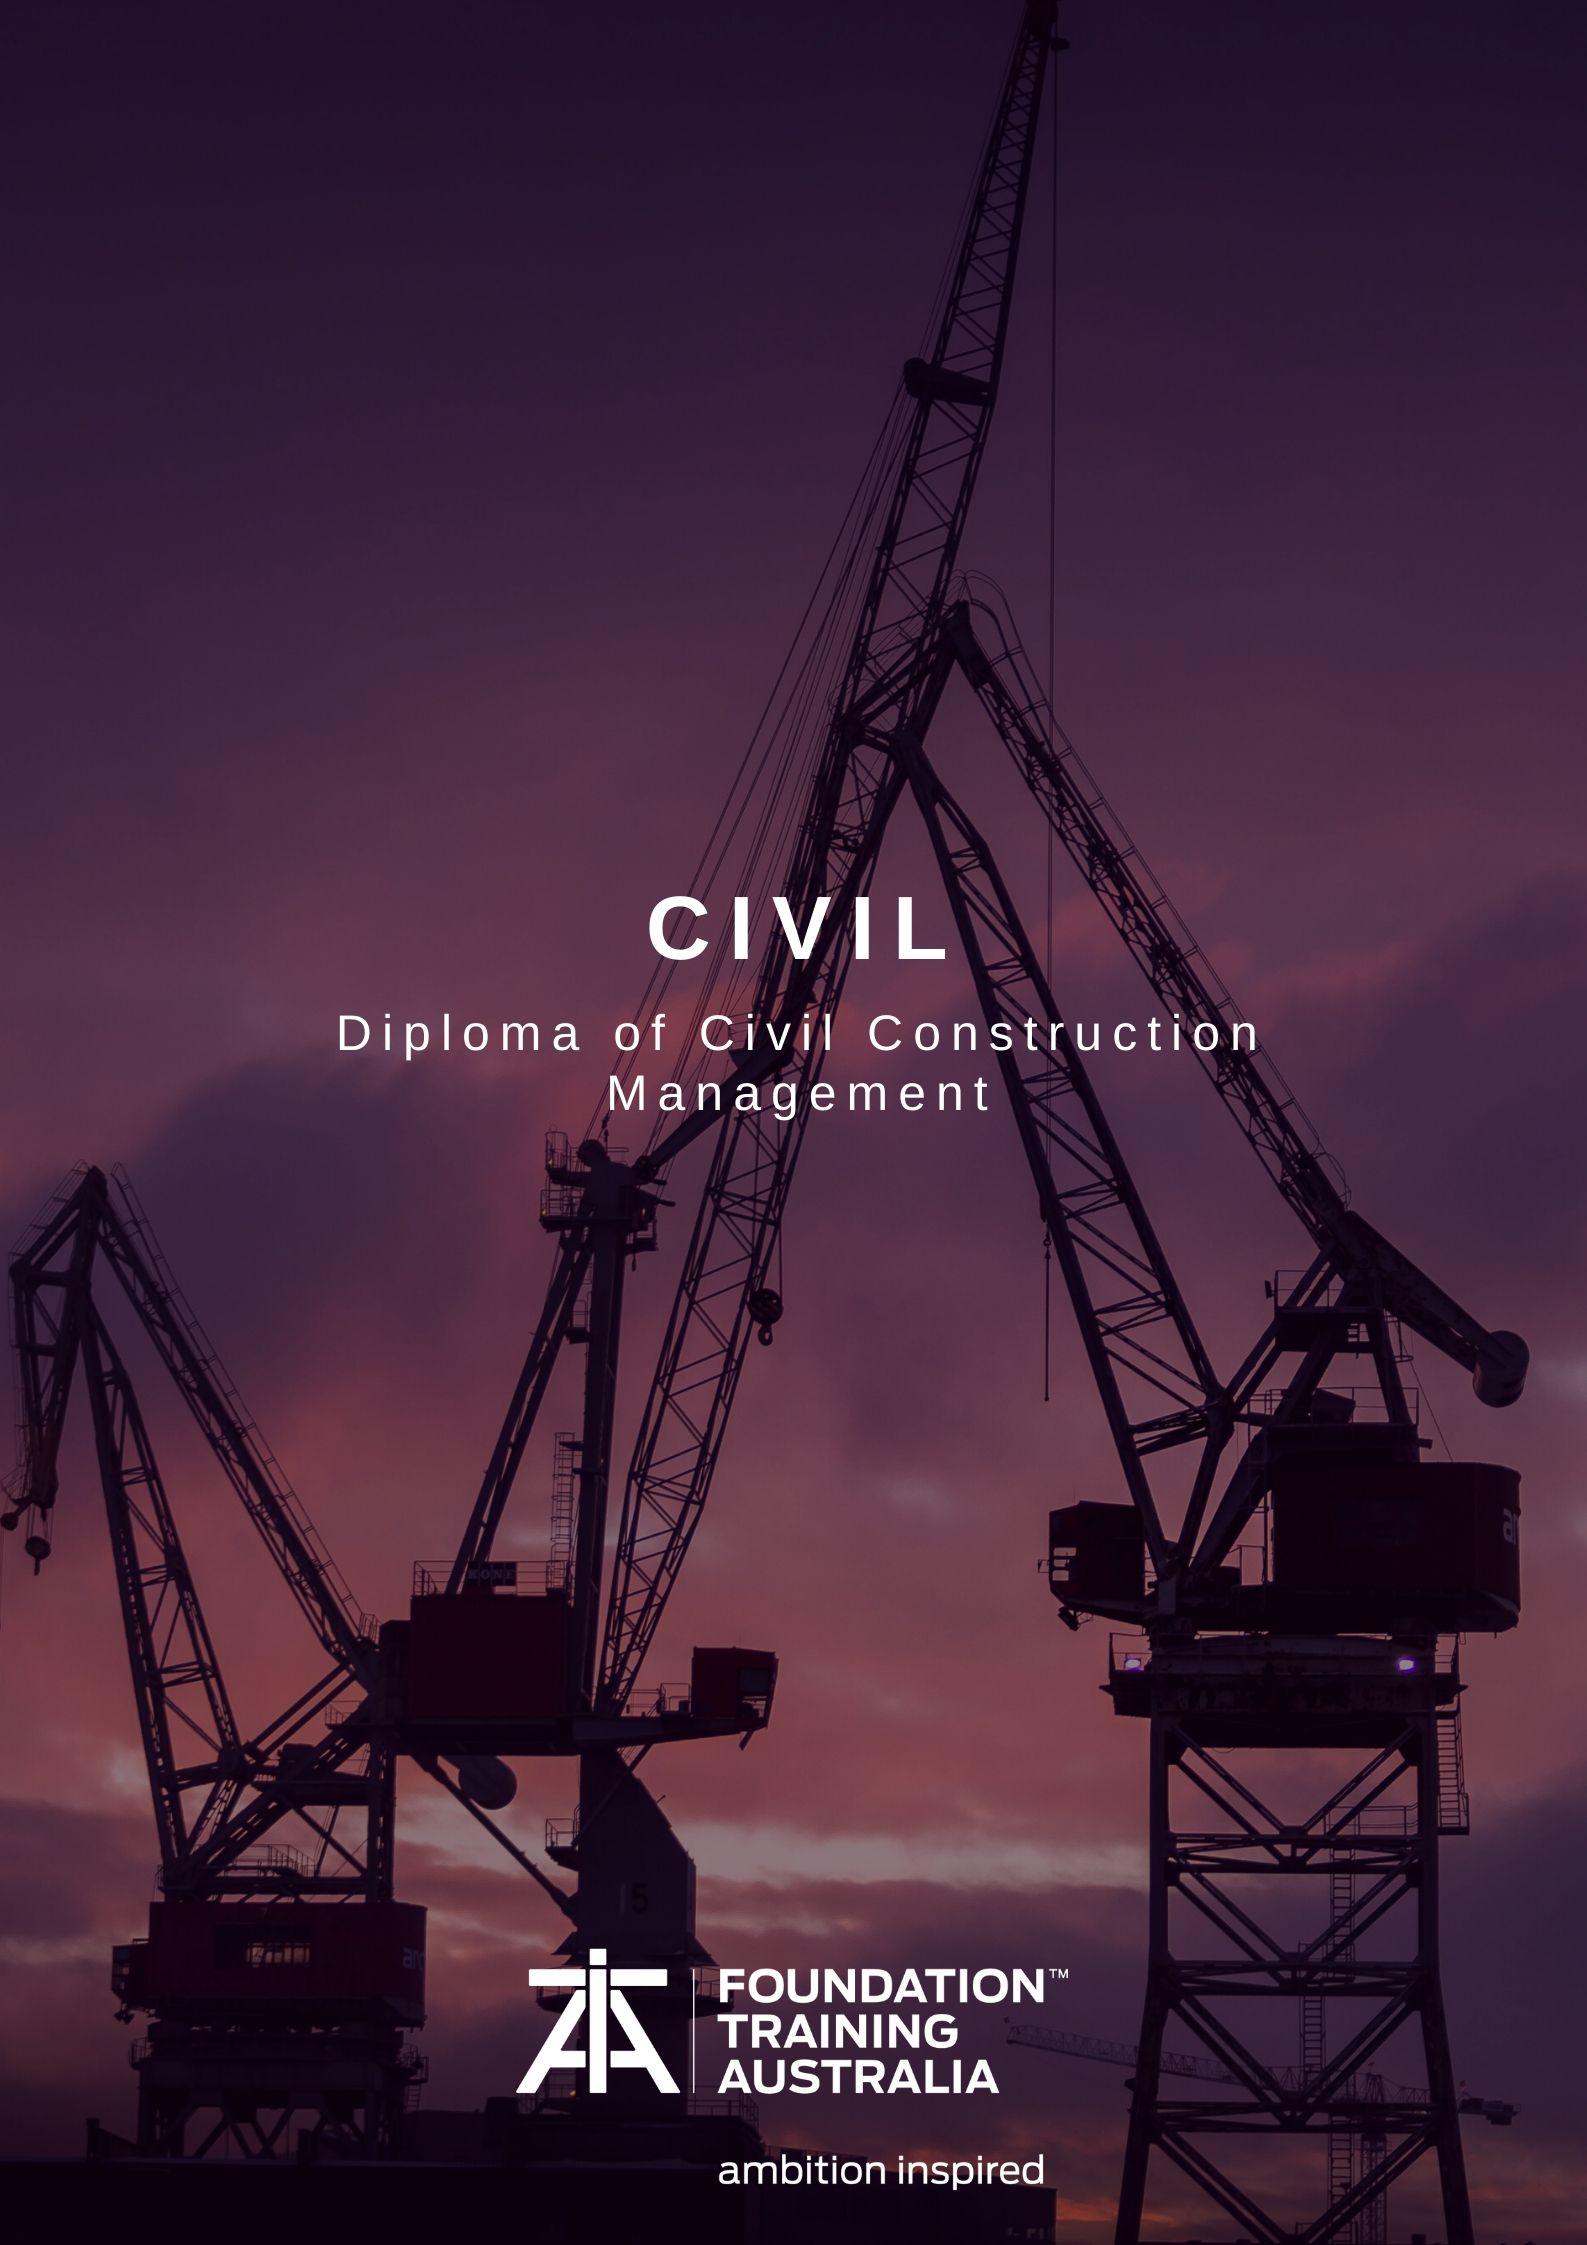 https://www.fta.edu.au/wp-content/uploads/2020/06/Civil-Flyer-Covers-5.jpg